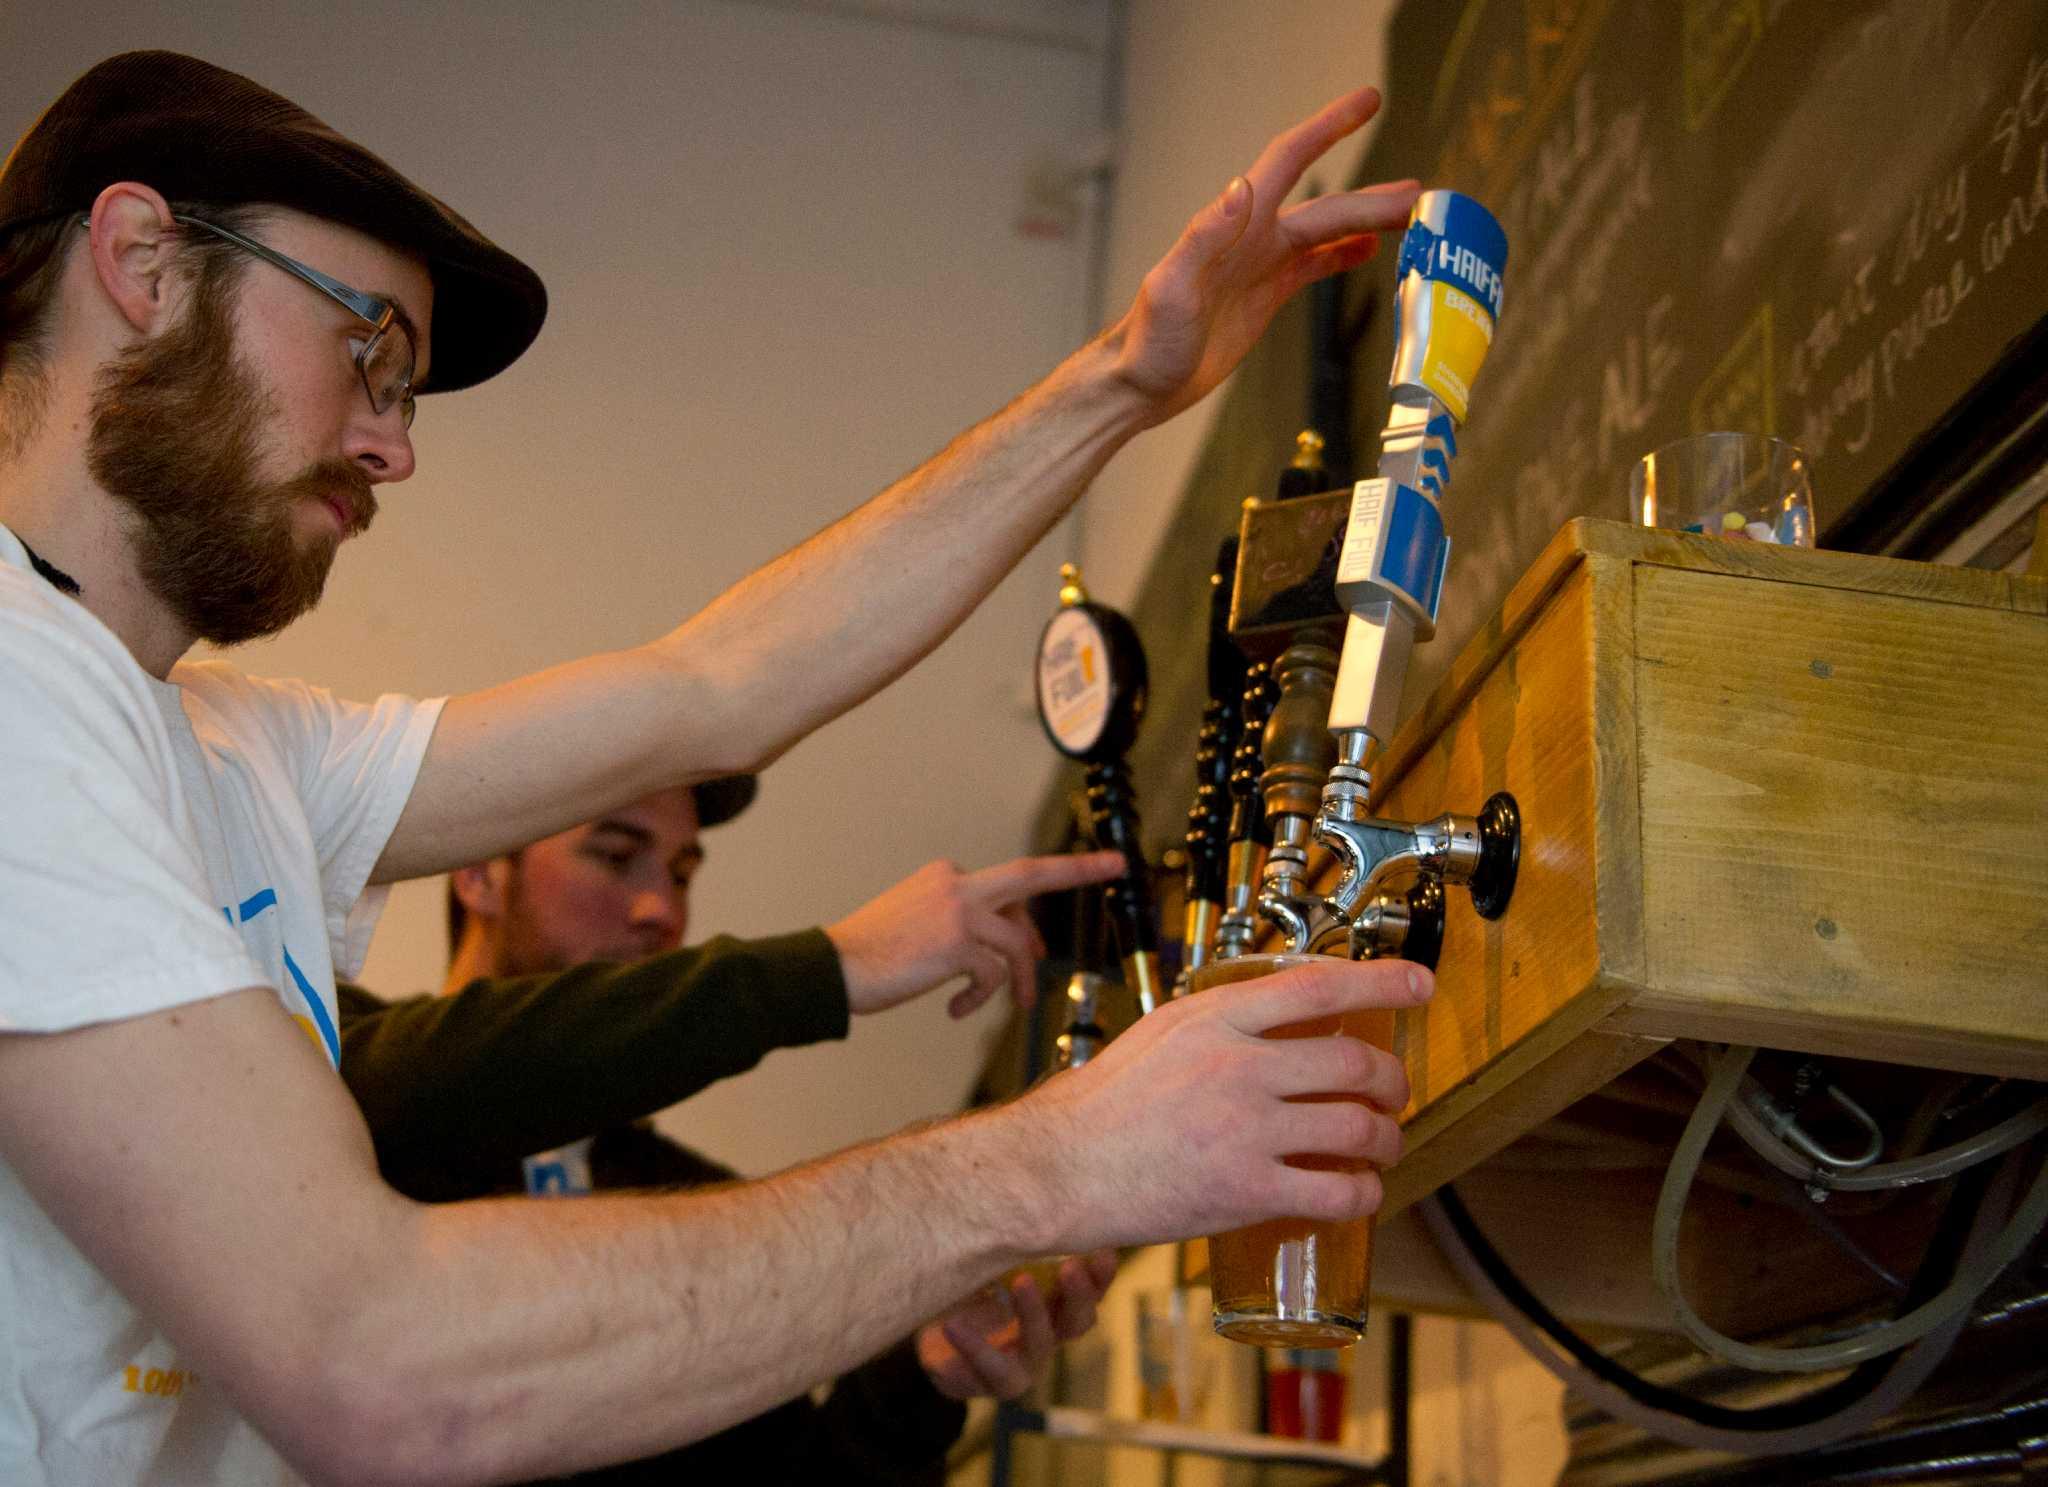 Brews on bedford brings craft beer to stamford for Craft store norwalk ct